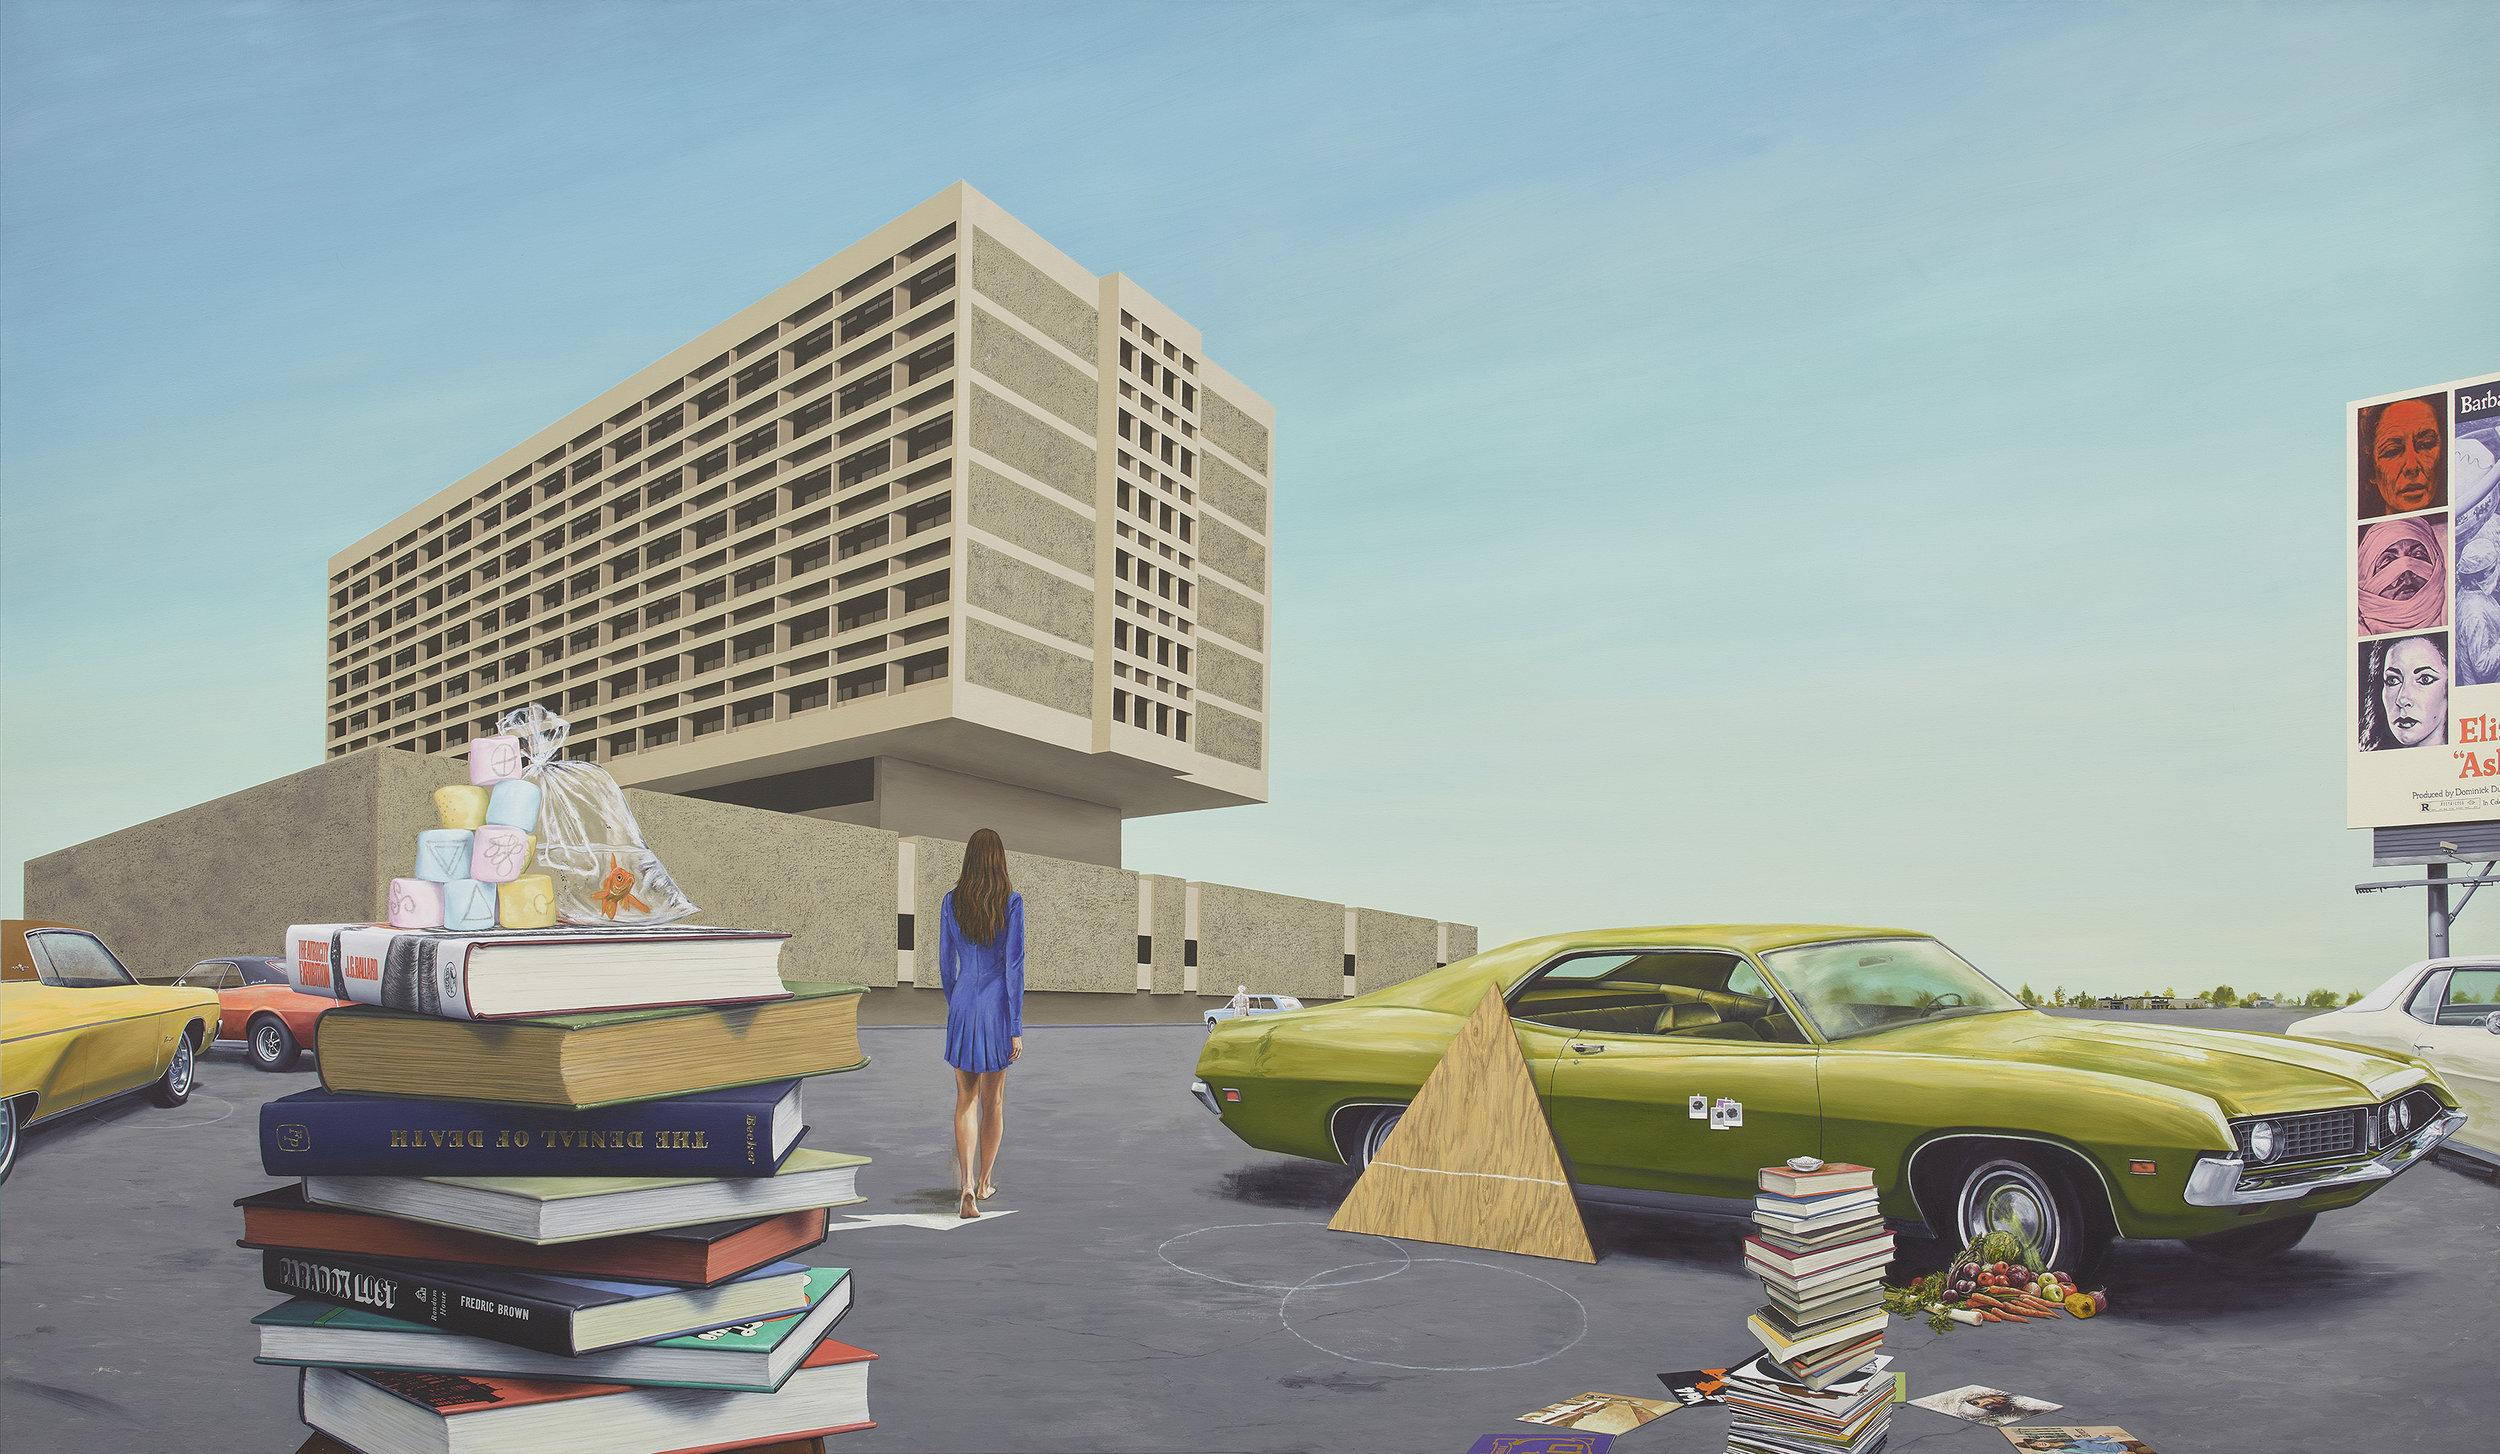 North [1971 Ford Torino]